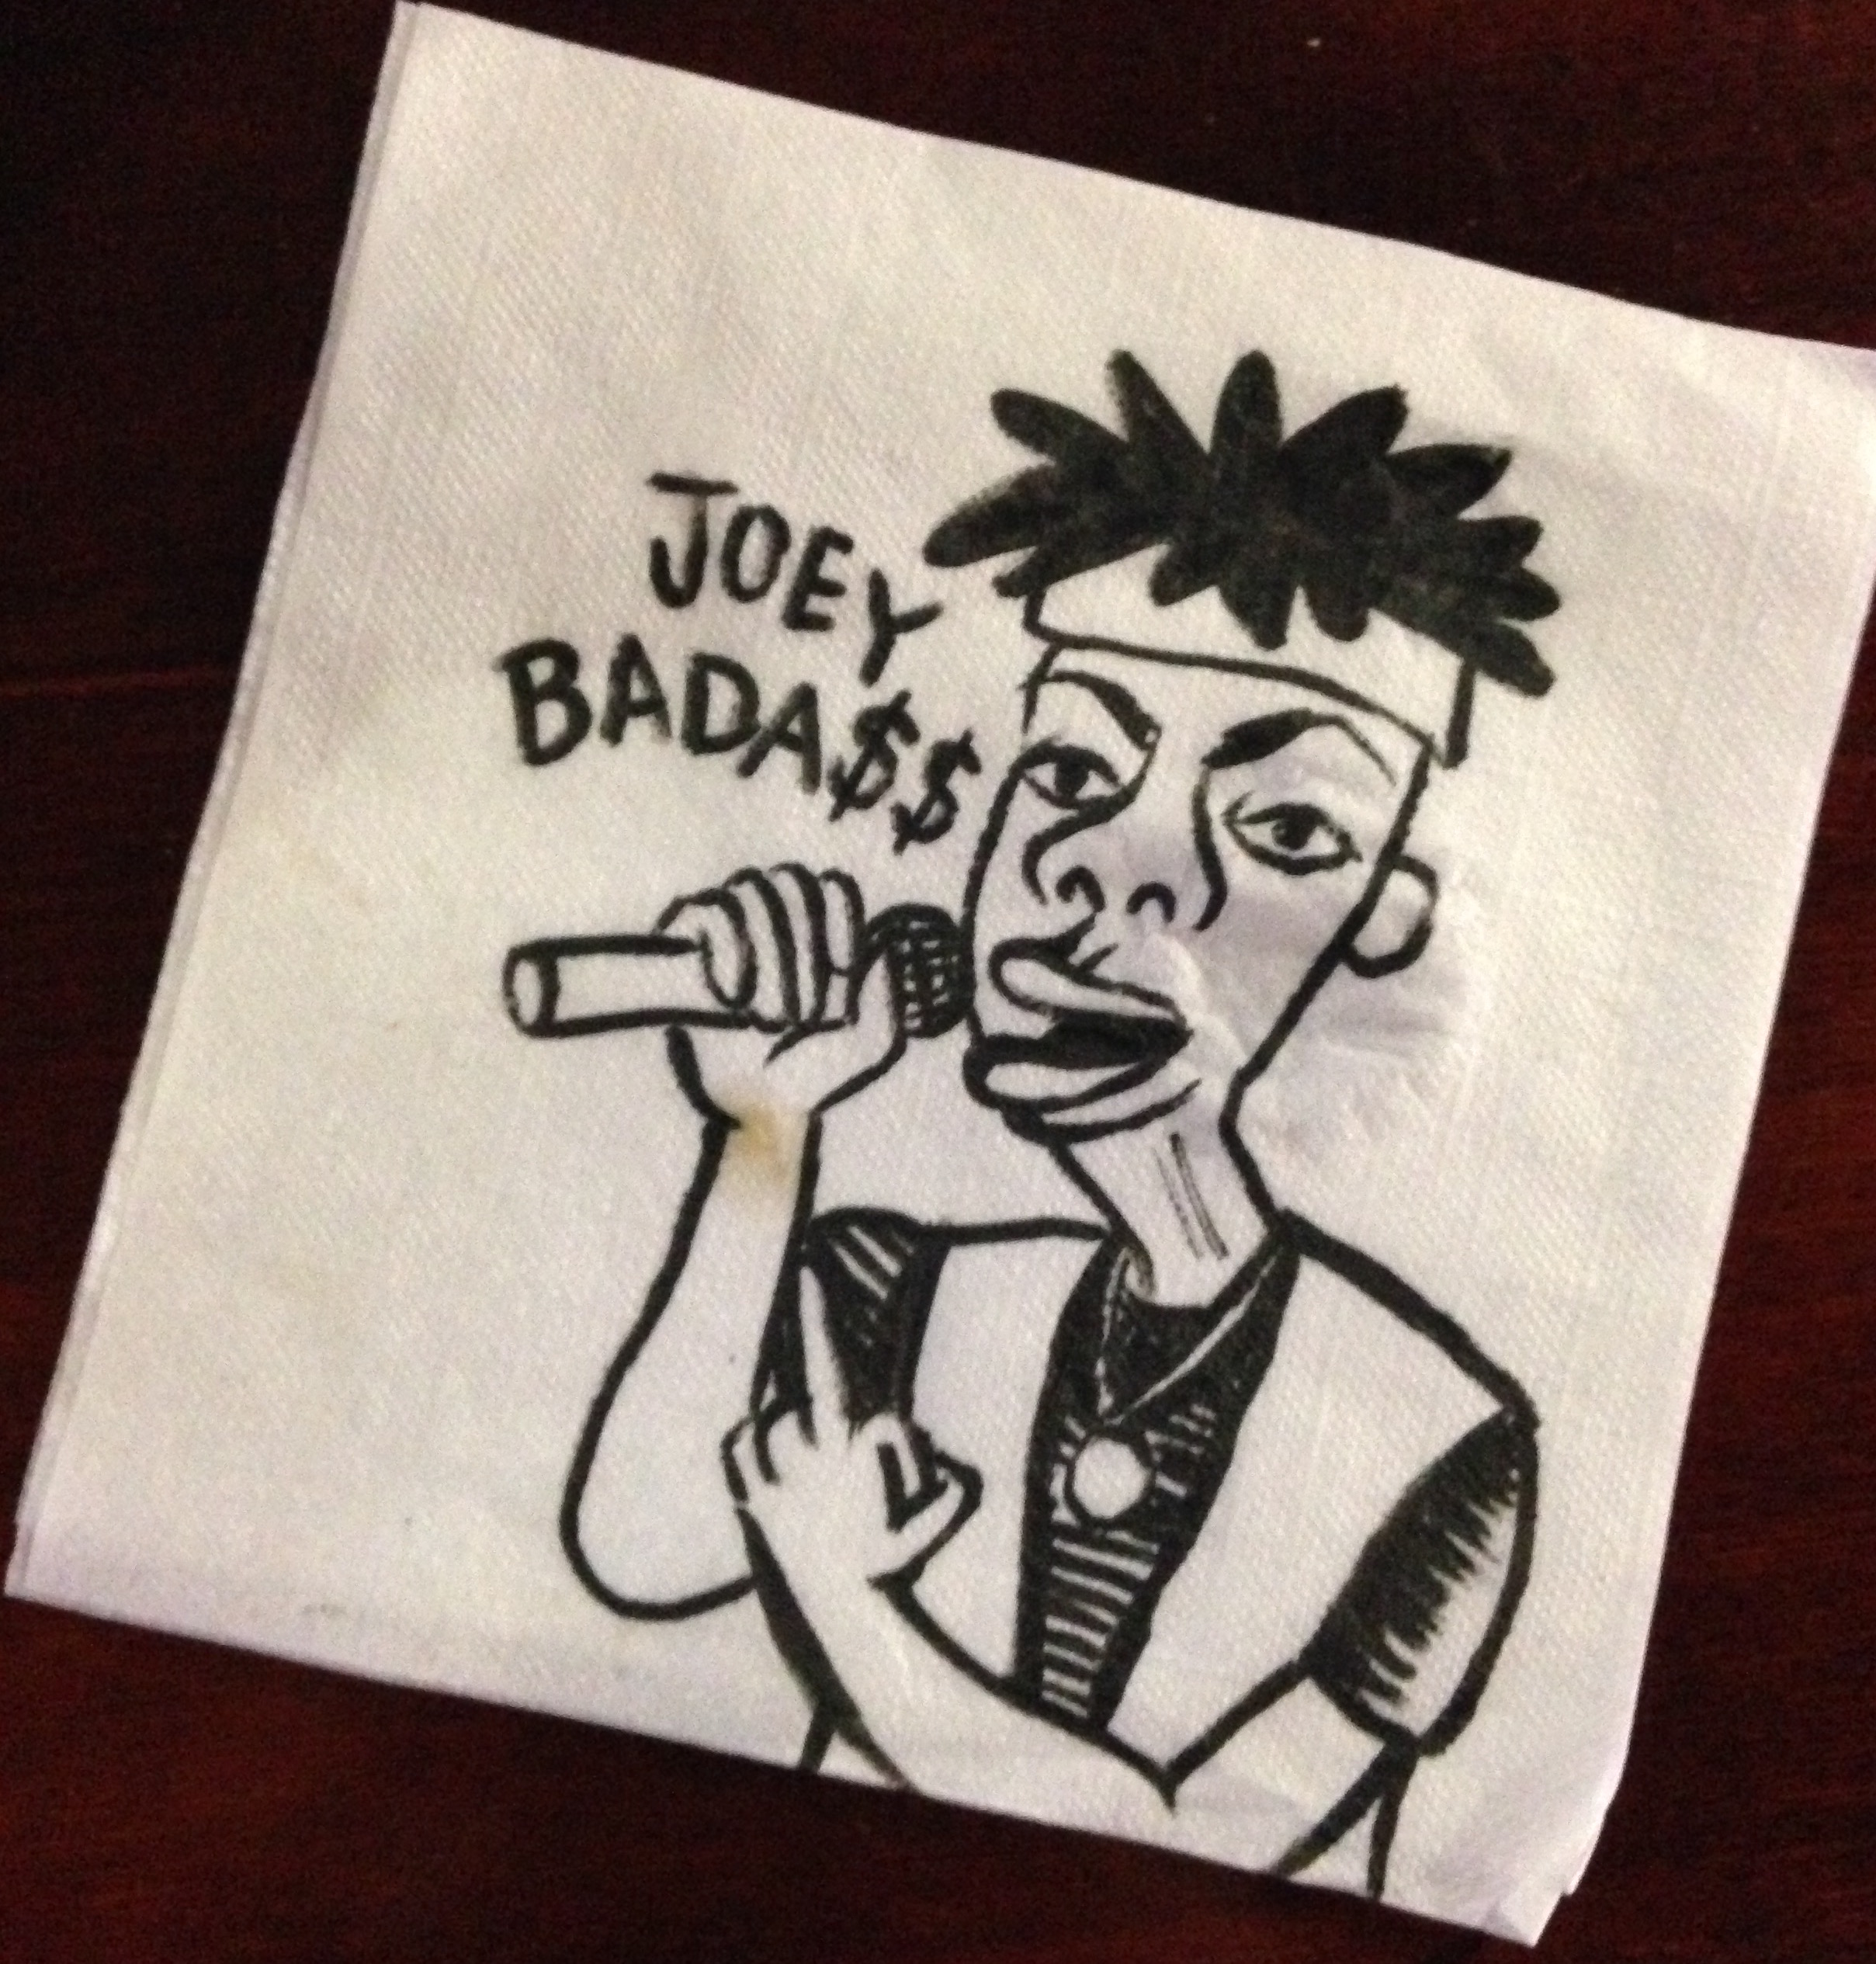 Joey Badass.JPG